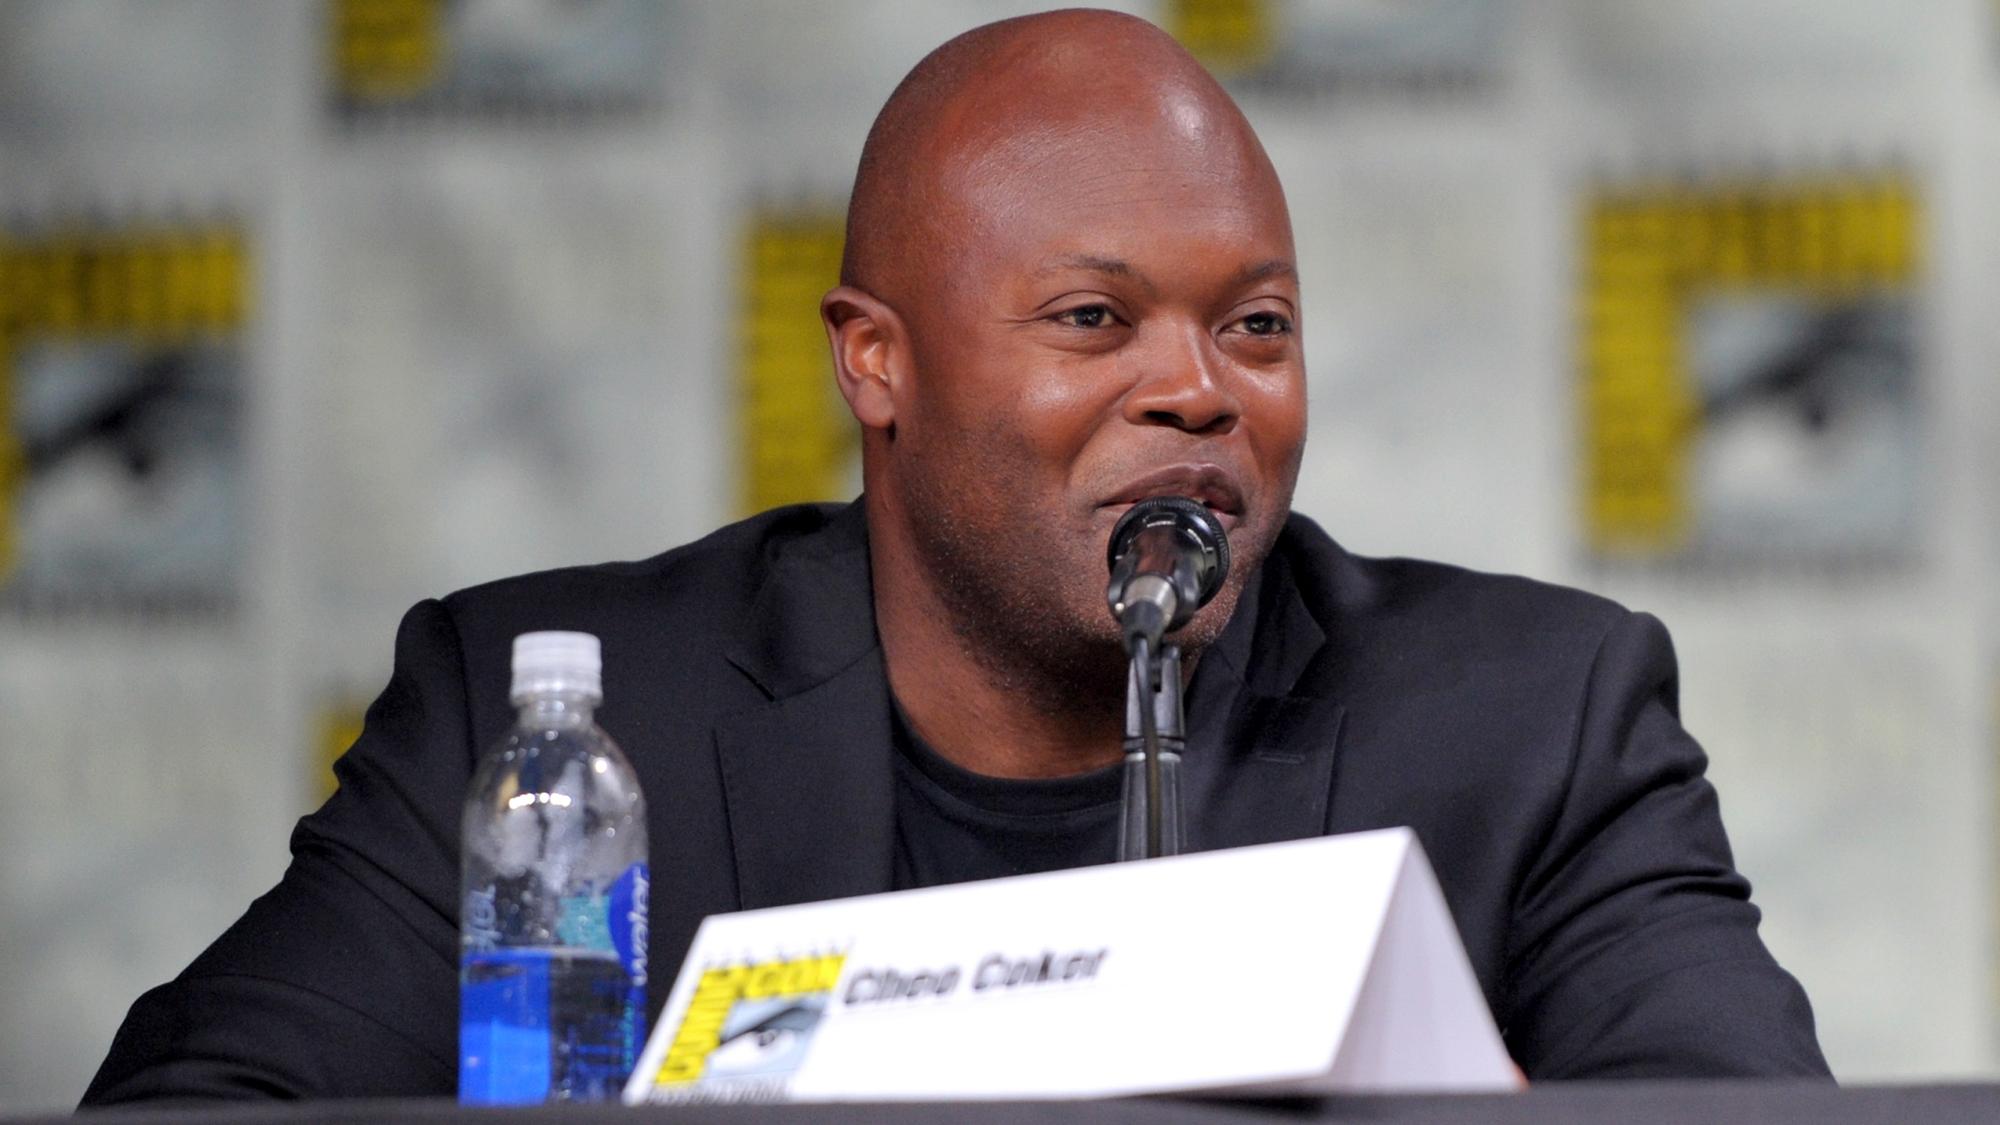 Netflix/Marvel's Luke Cage At San Diego Comic-Con 2016